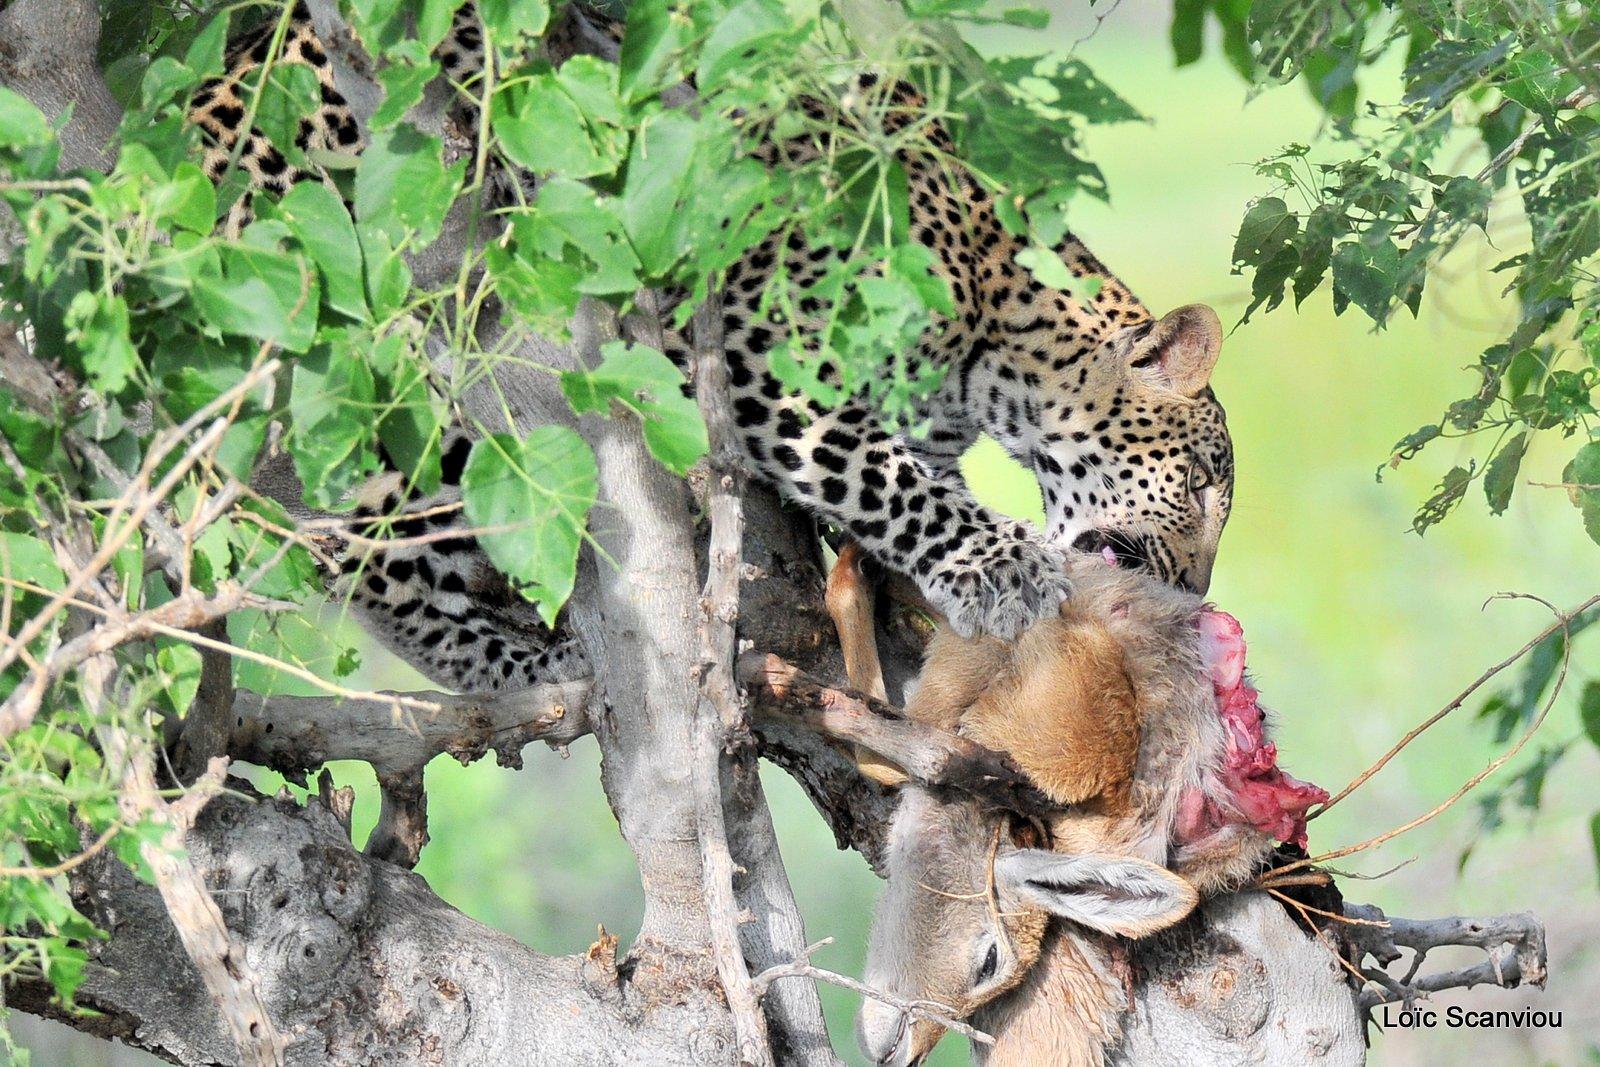 Léopard qui mange/Leopard eating (5)